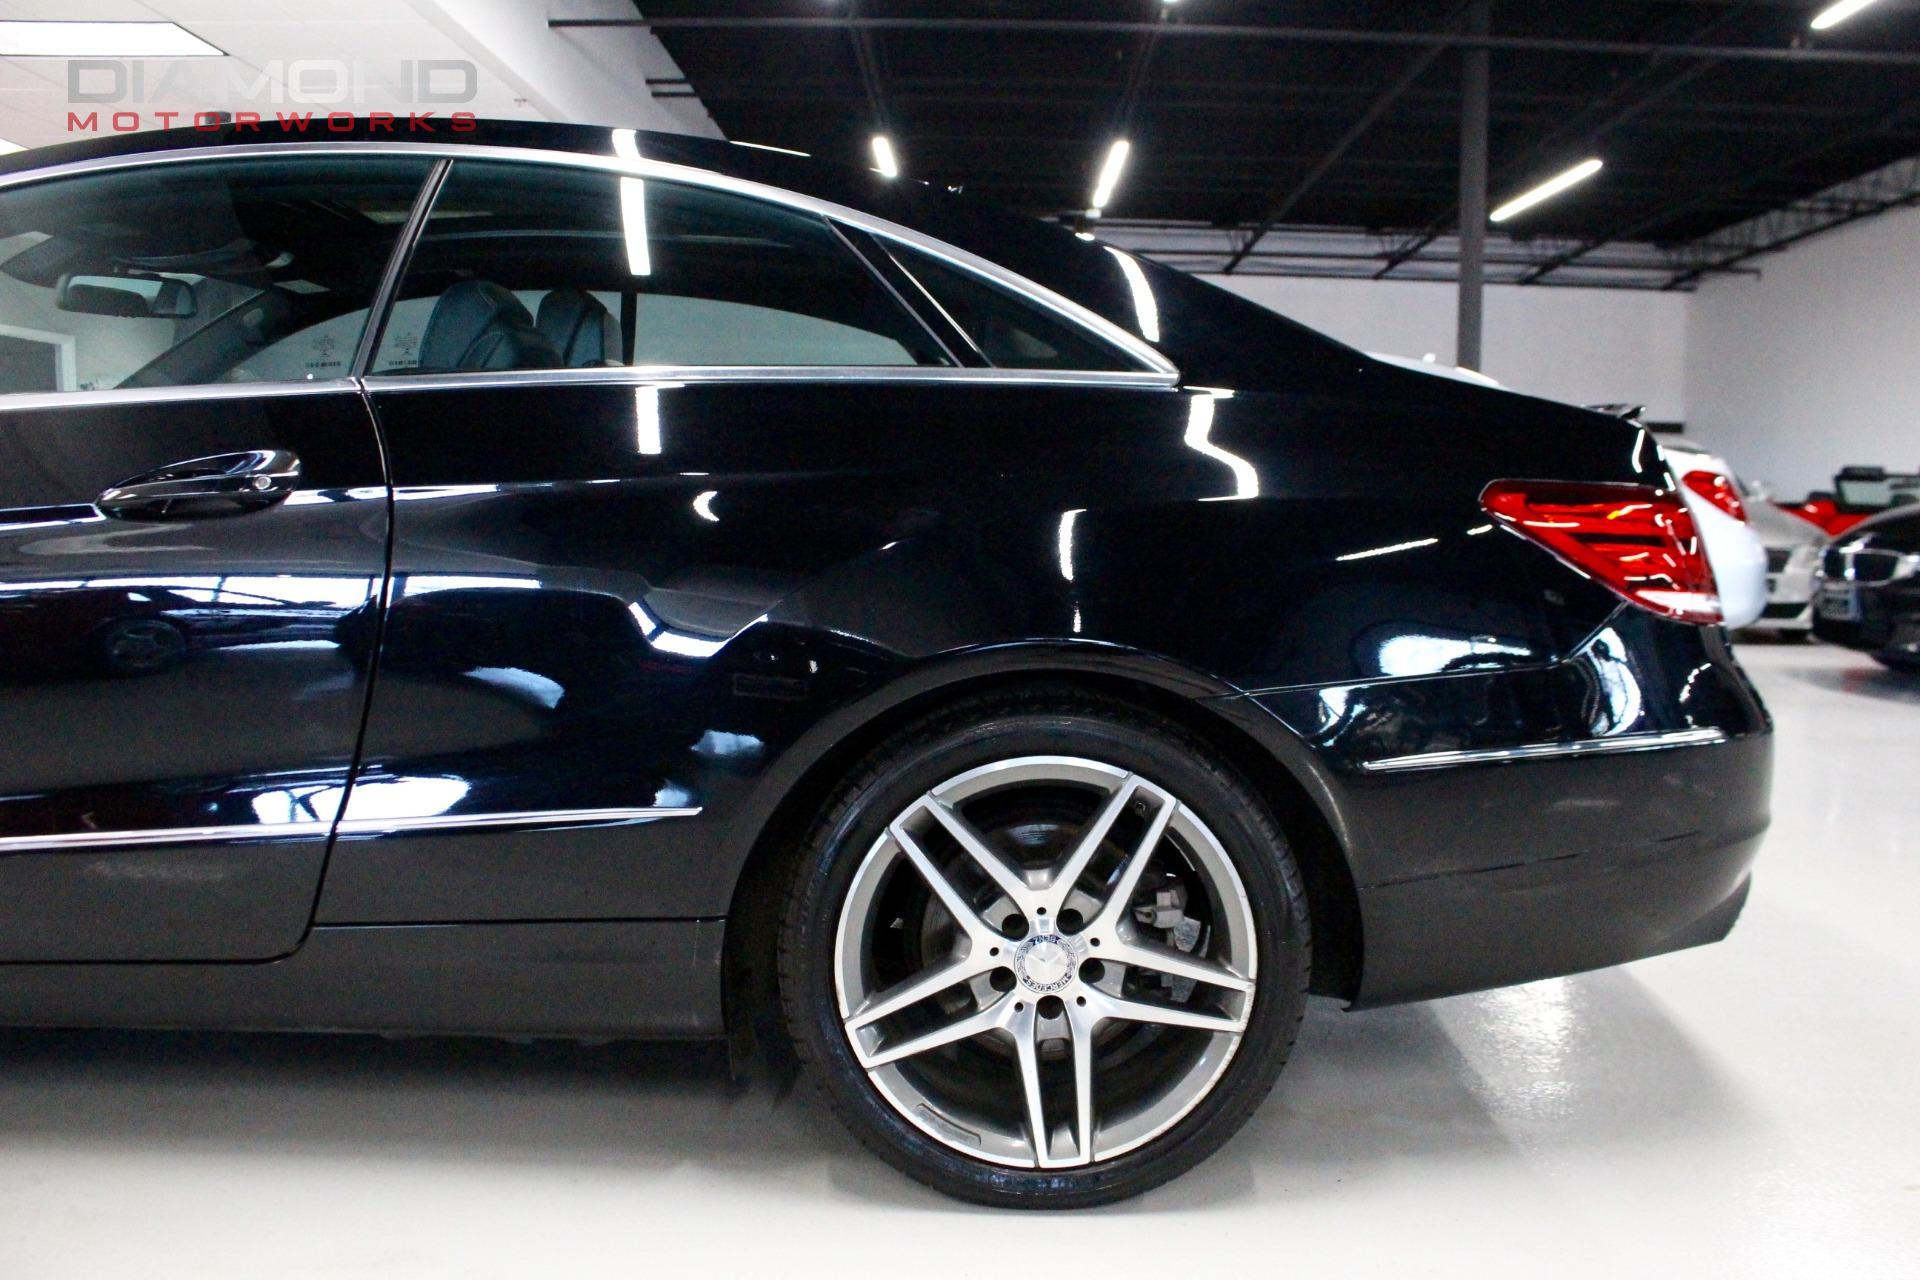 Used 2014 mercedes benz e class e 350 4matic coupe - Mercedes classe e 350 coupe ...